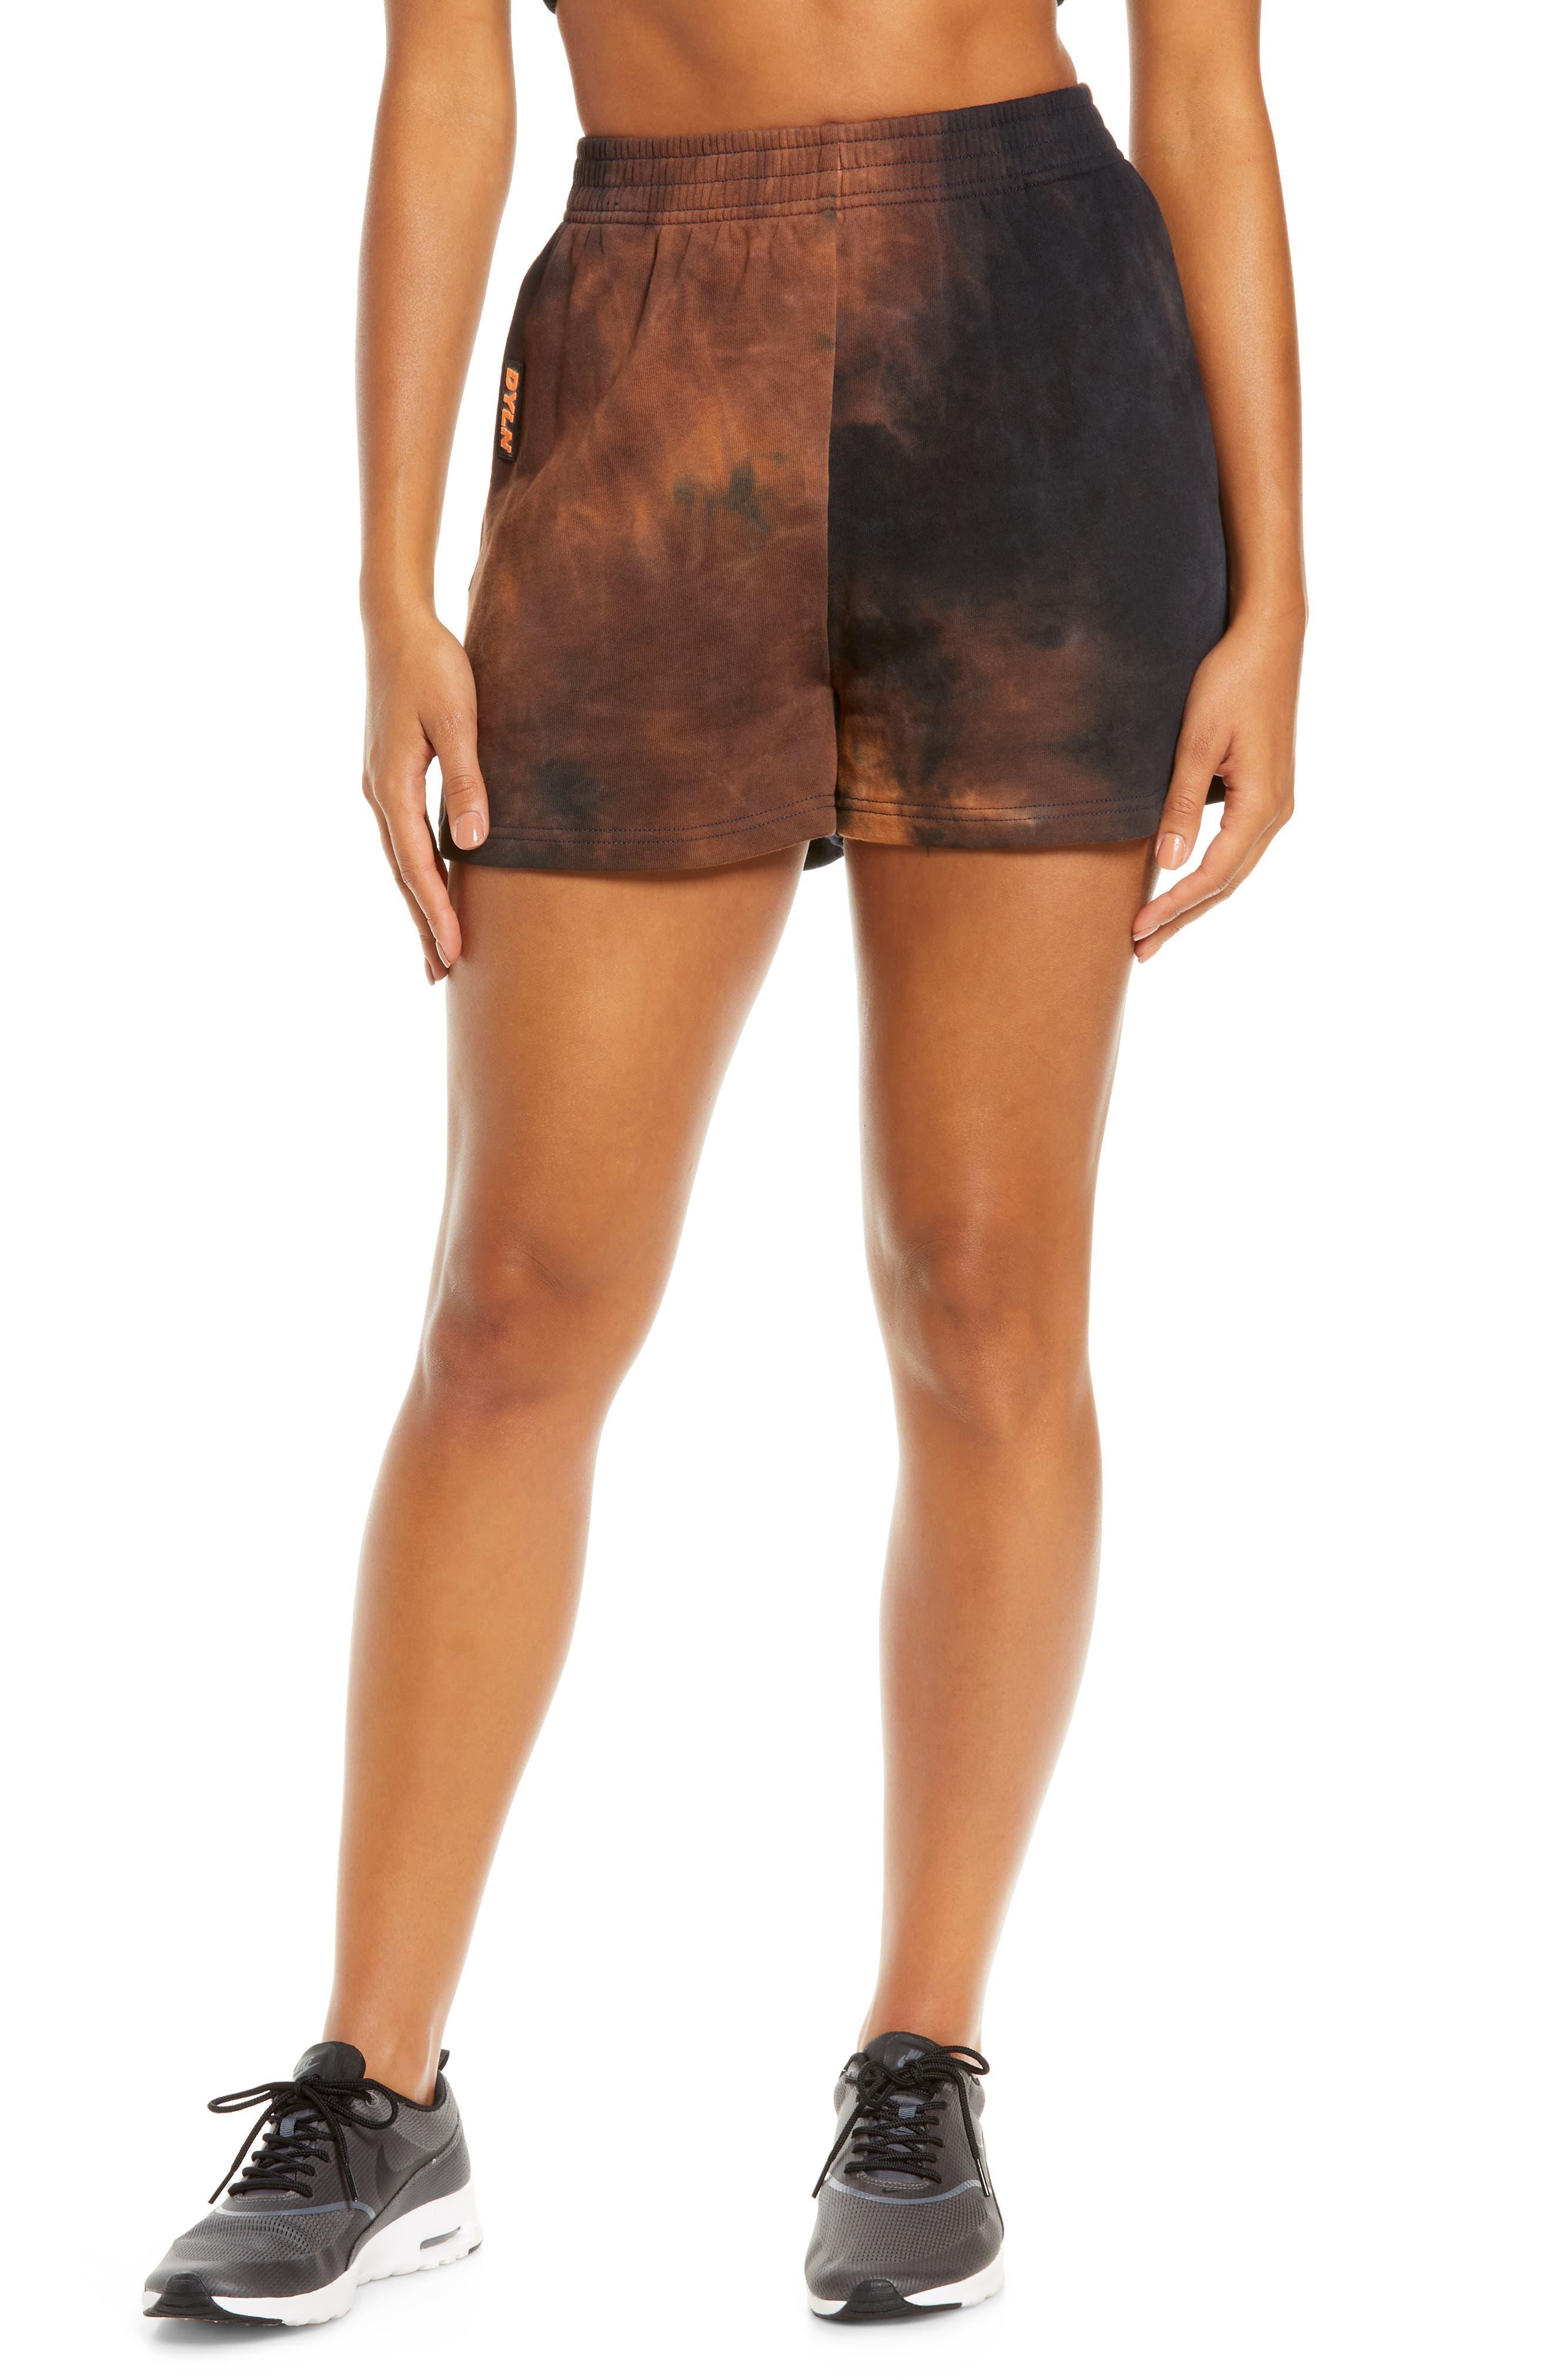 Women's By. dyln Eadie High Waist Tie Dye Shorts